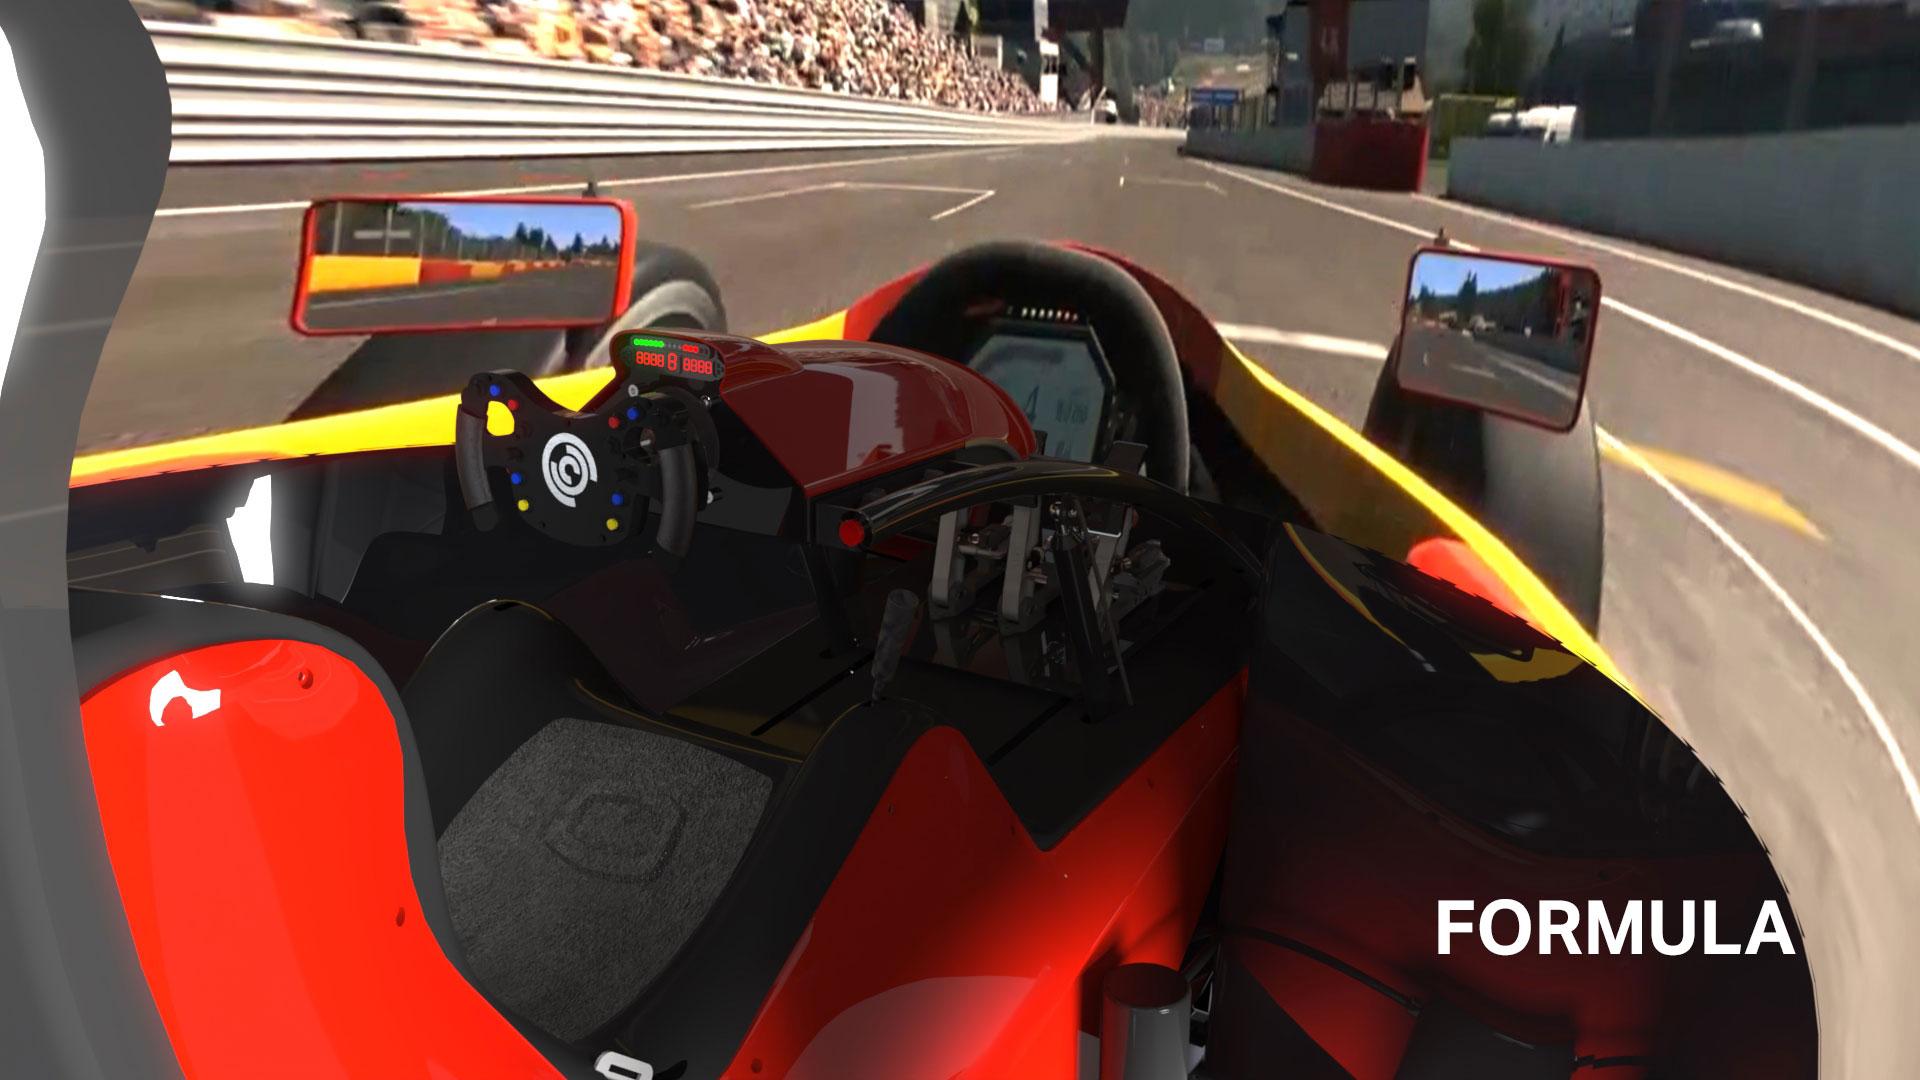 Formula cockpit